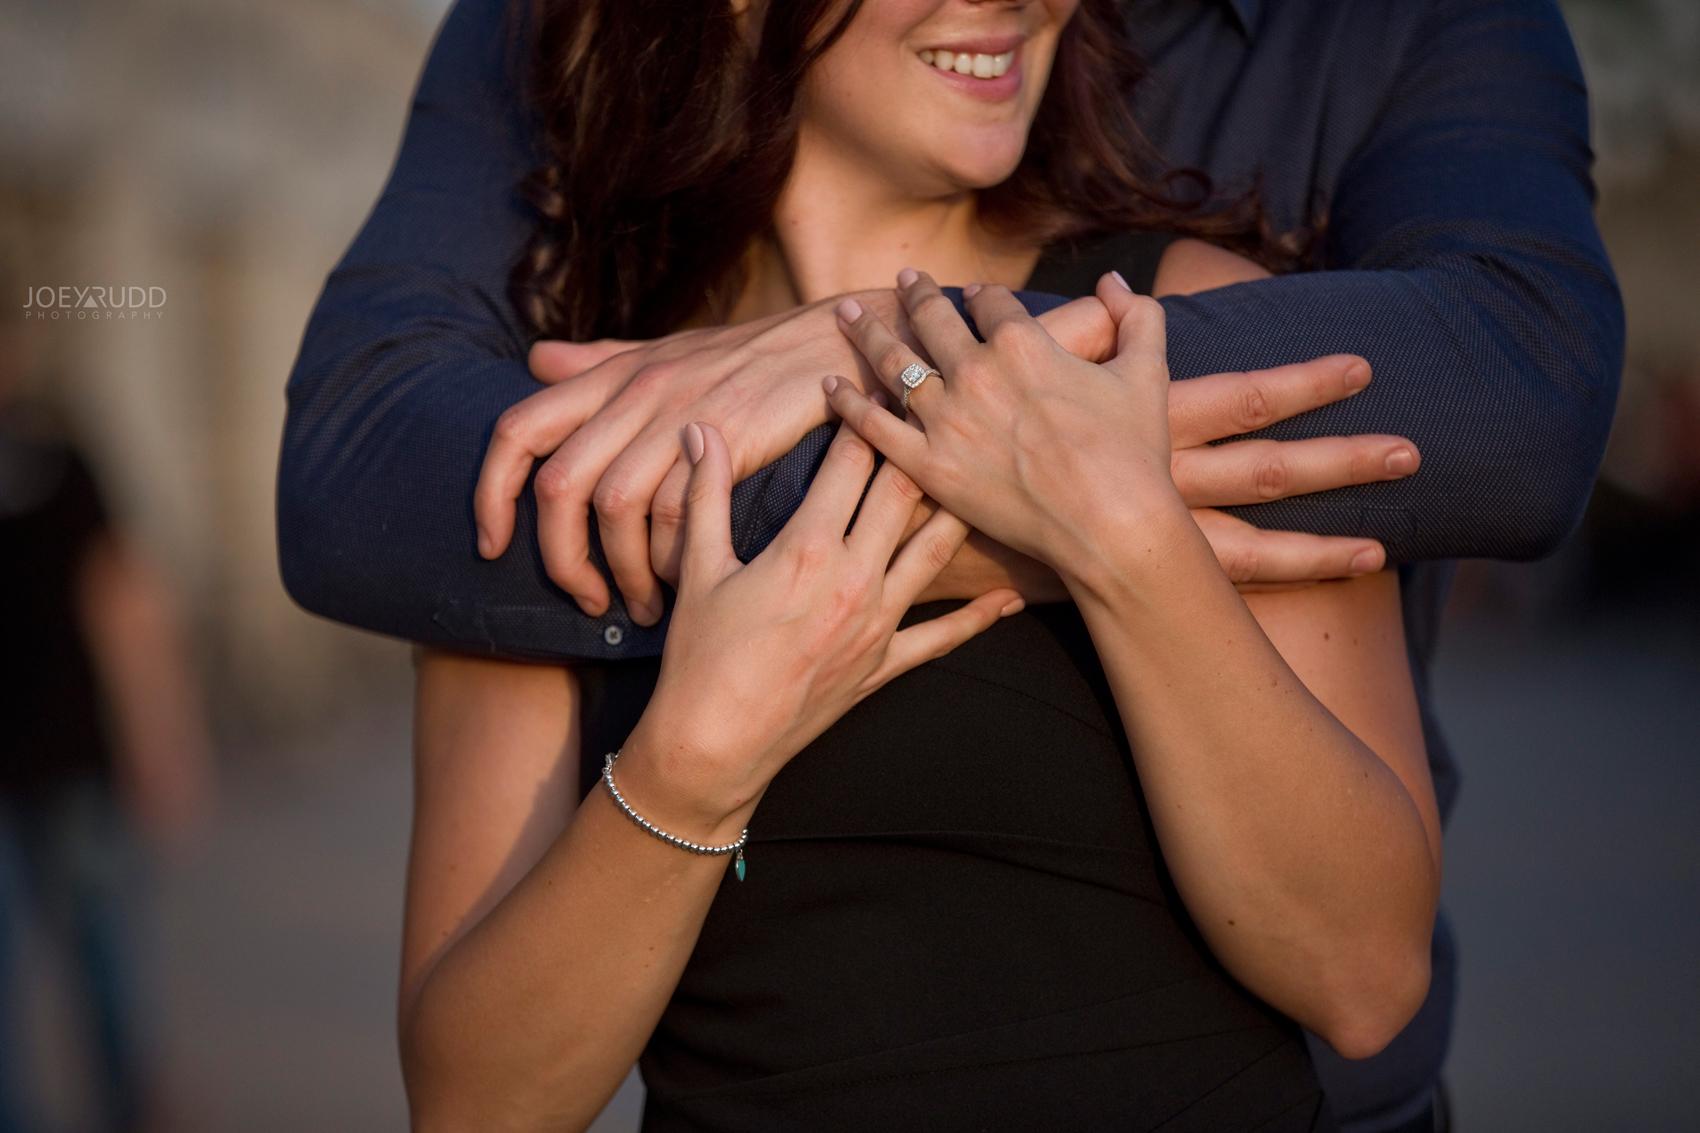 Engagement Photos, Ottawa Photographer, Ottawa Wedding, Ottawa Wedding photographer, downtown ottawa, chateau laurier, light leaks, fun, happy, enaged, photographer, joey rudd photography, details